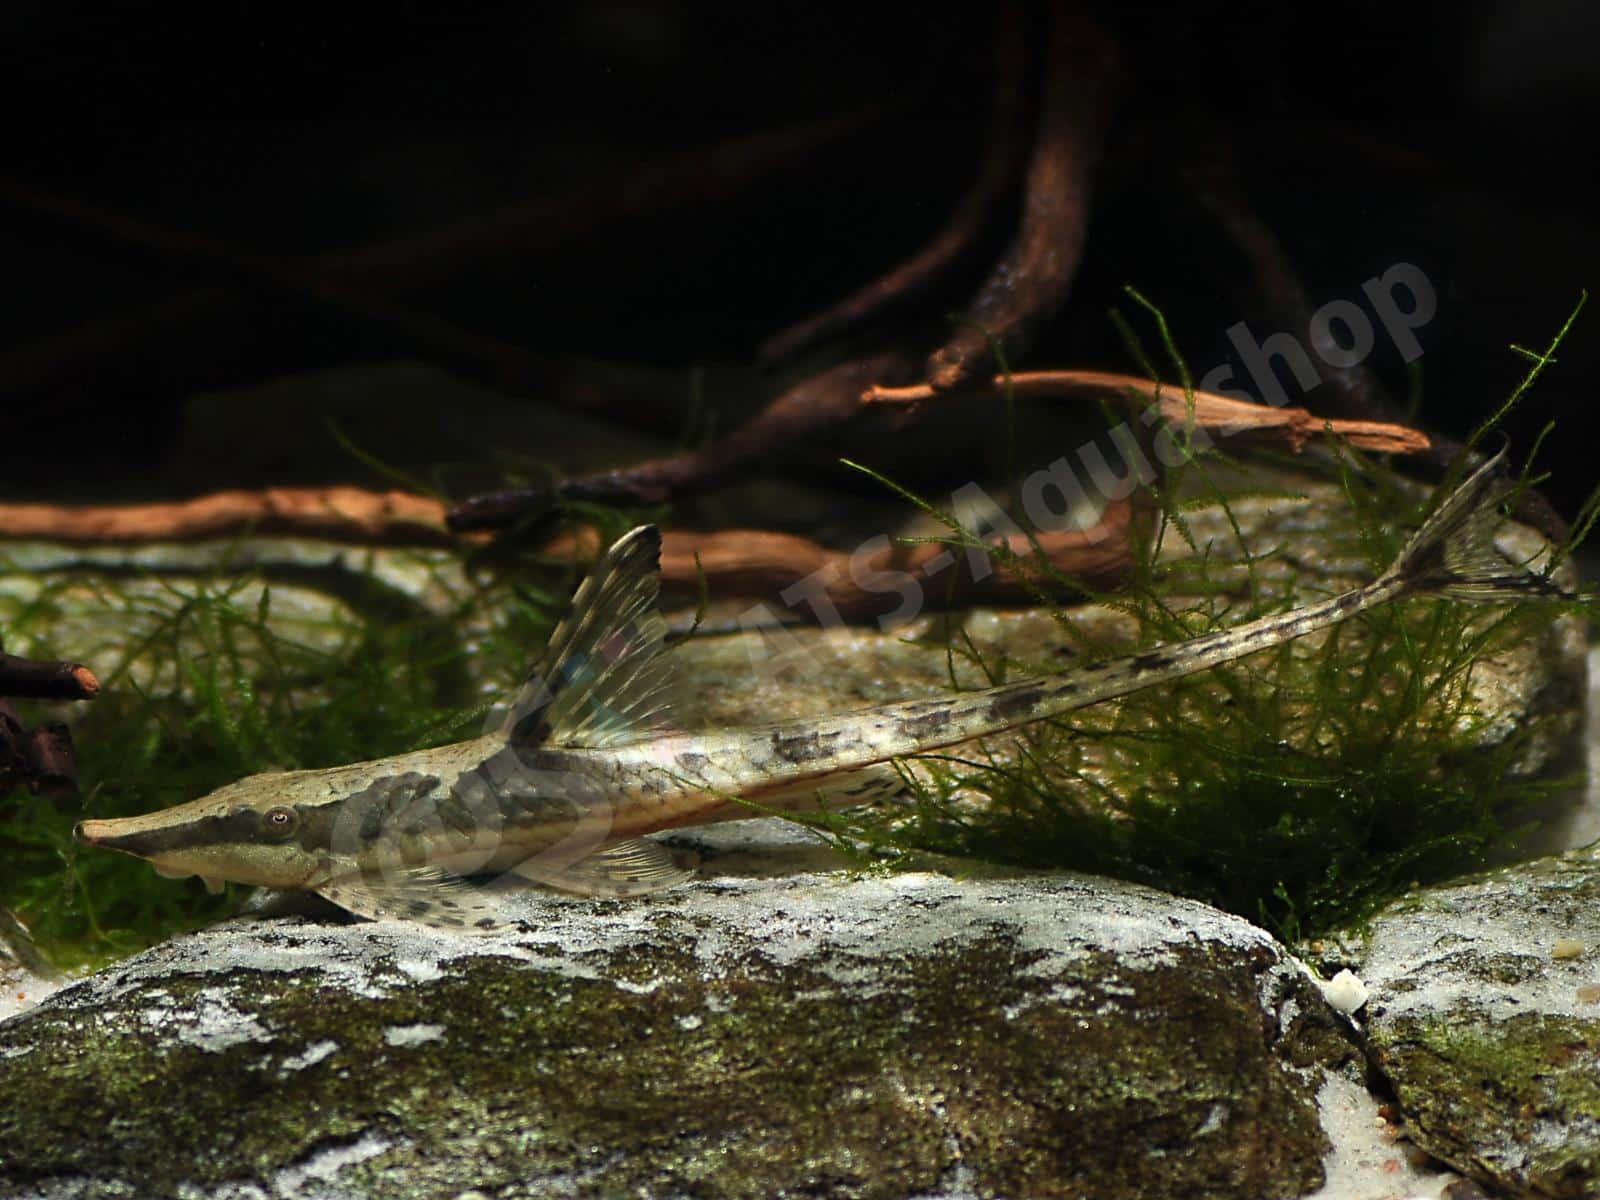 sturisomatichthys aureum enrico richter 0025 7